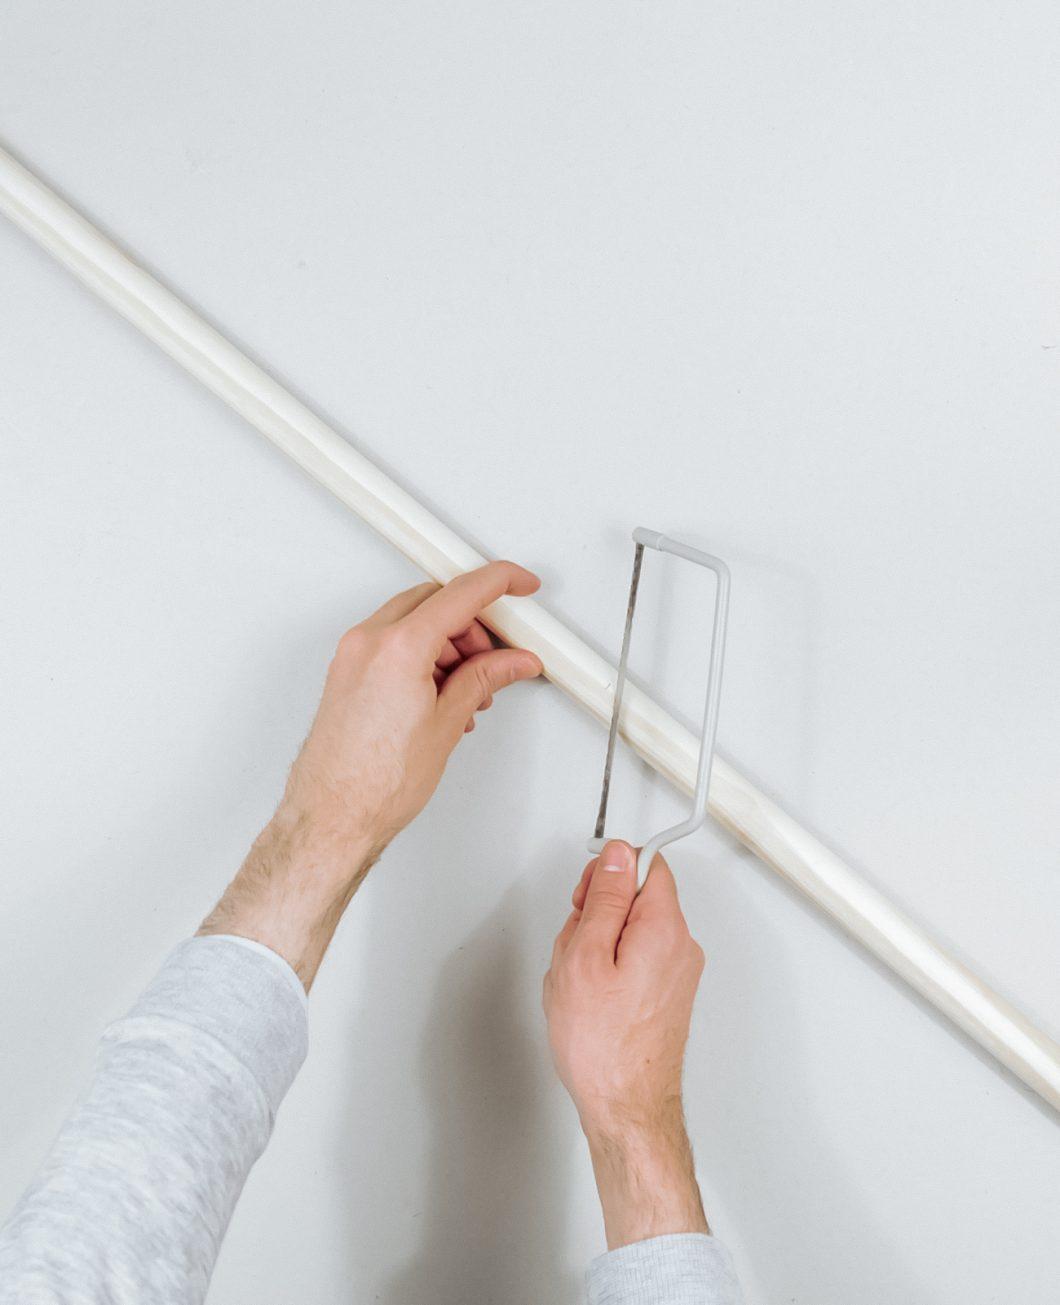 tapis deco murale boheme broderie Ikea Hack tuto dia etape 5